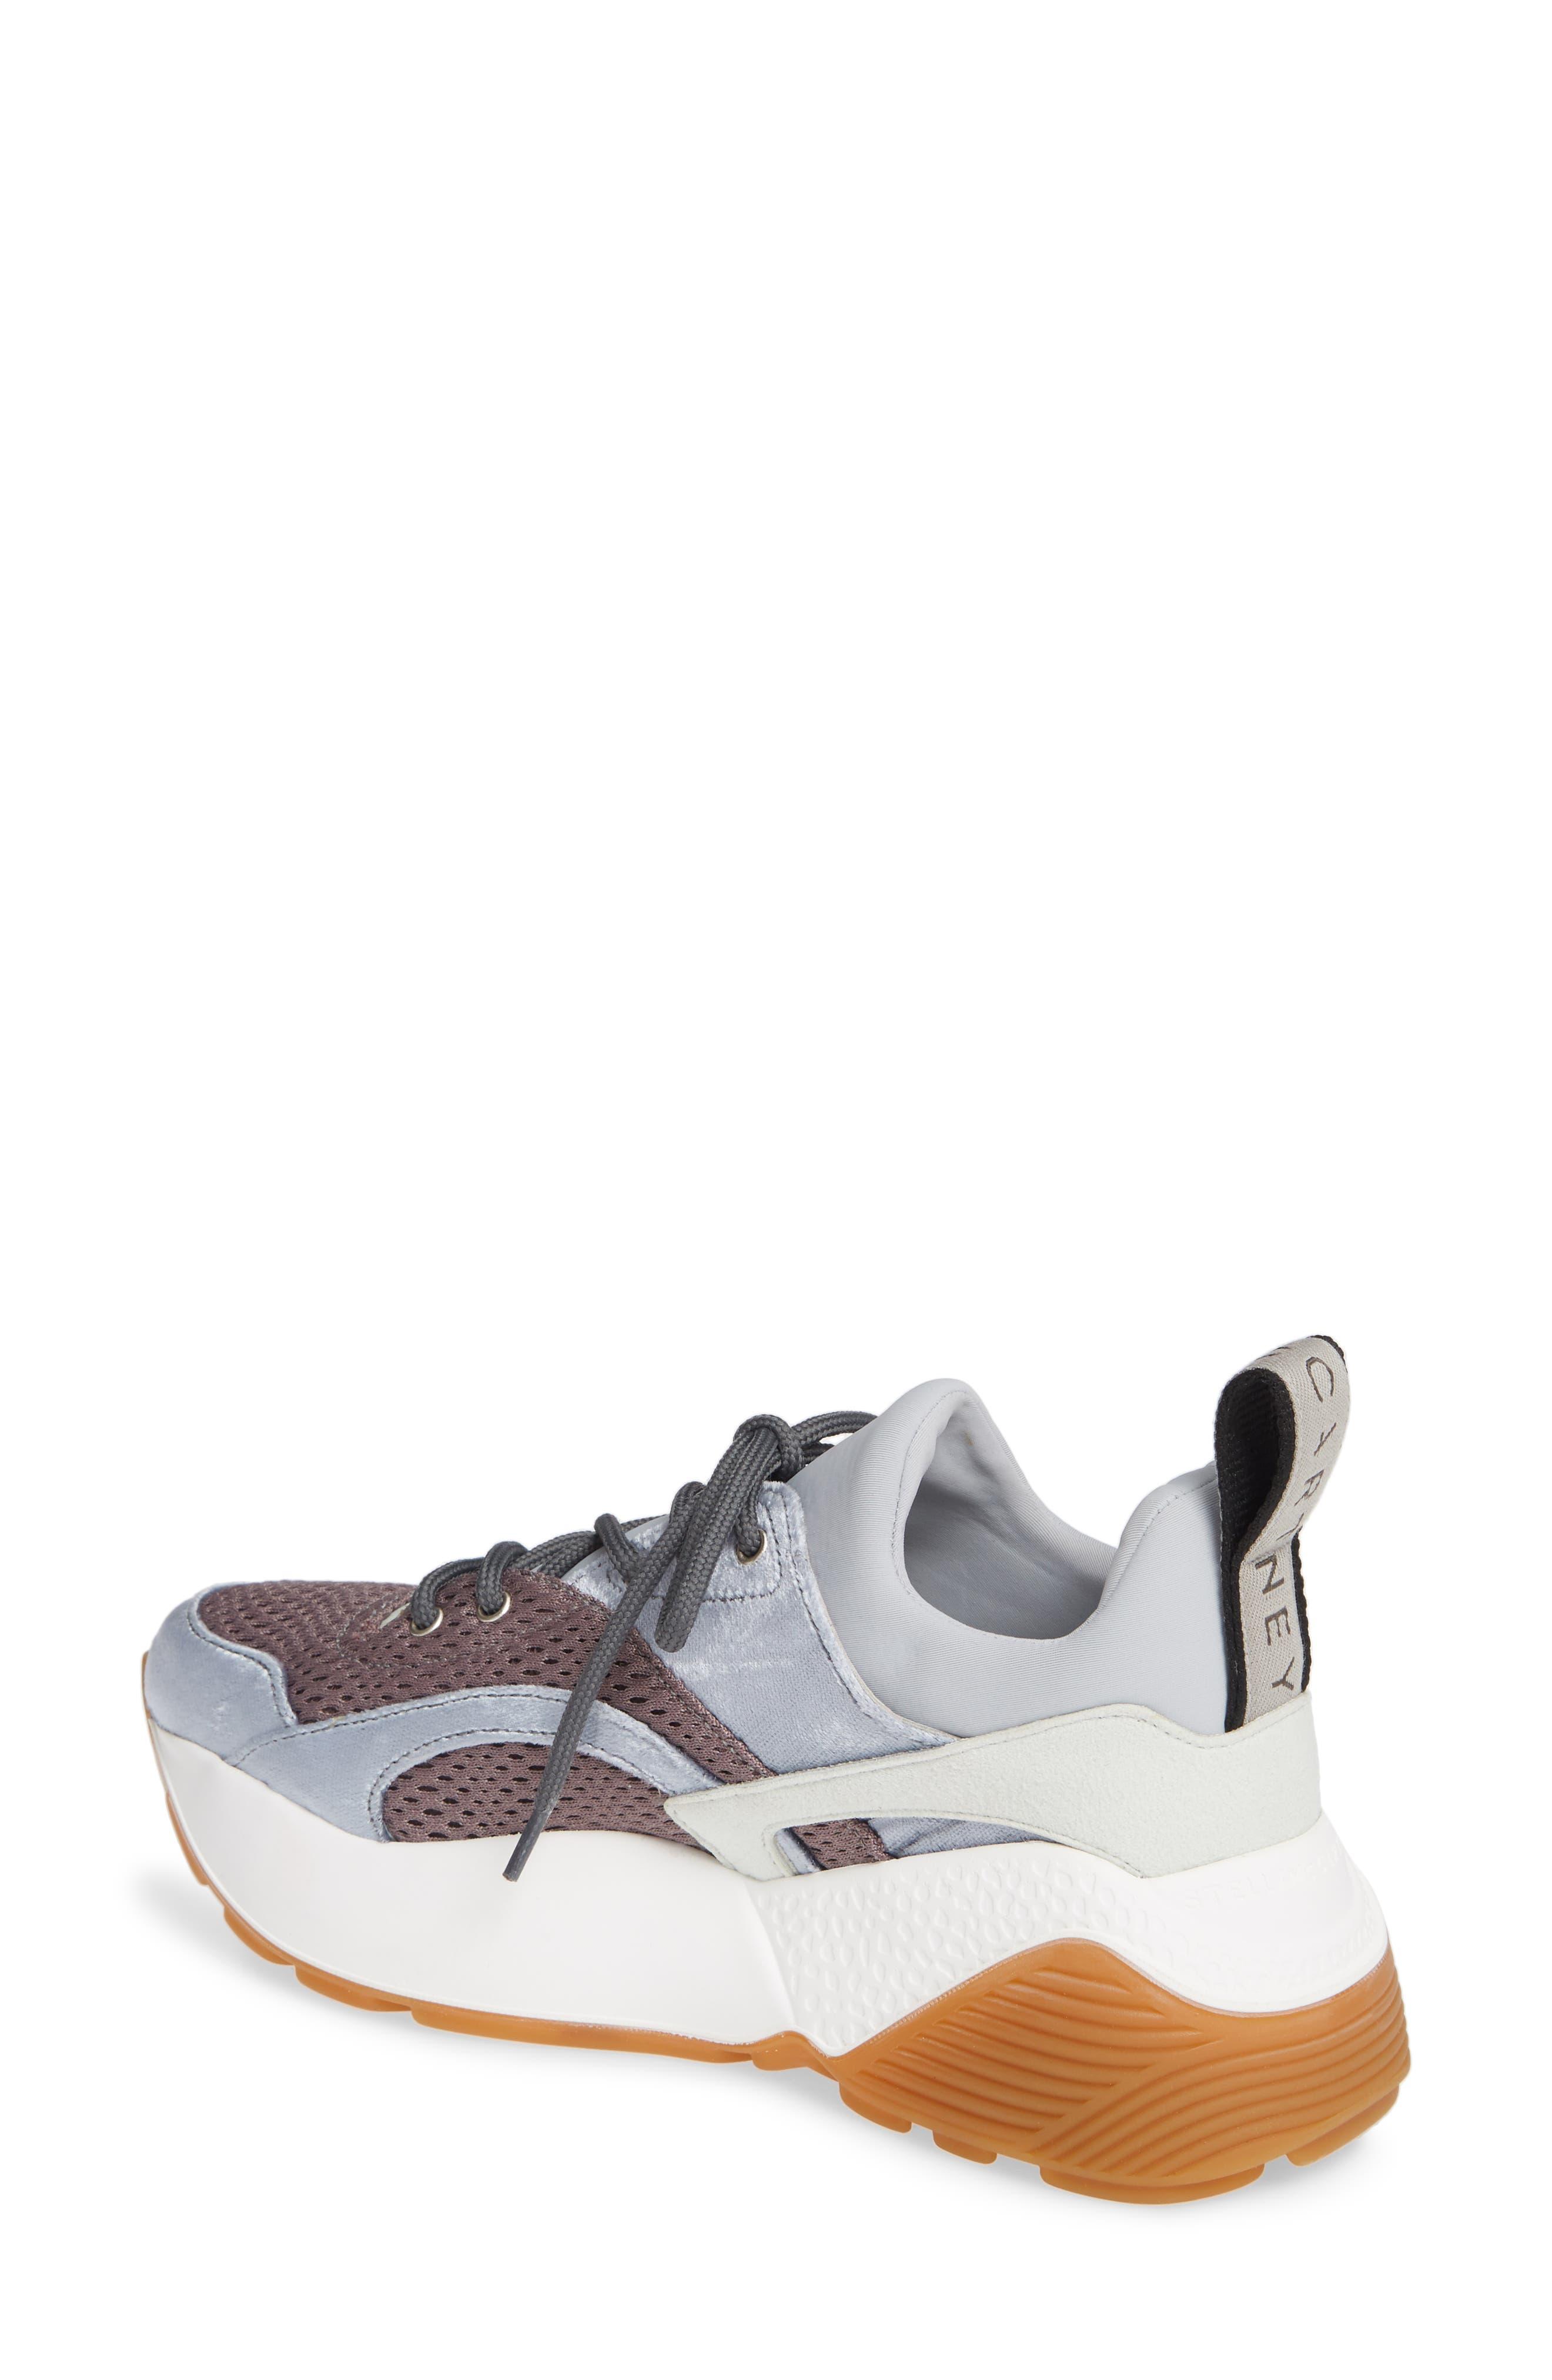 Eclypse Lace-Up Sneaker,                             Alternate thumbnail 2, color,                             GREY/ SILVER/ WHITE